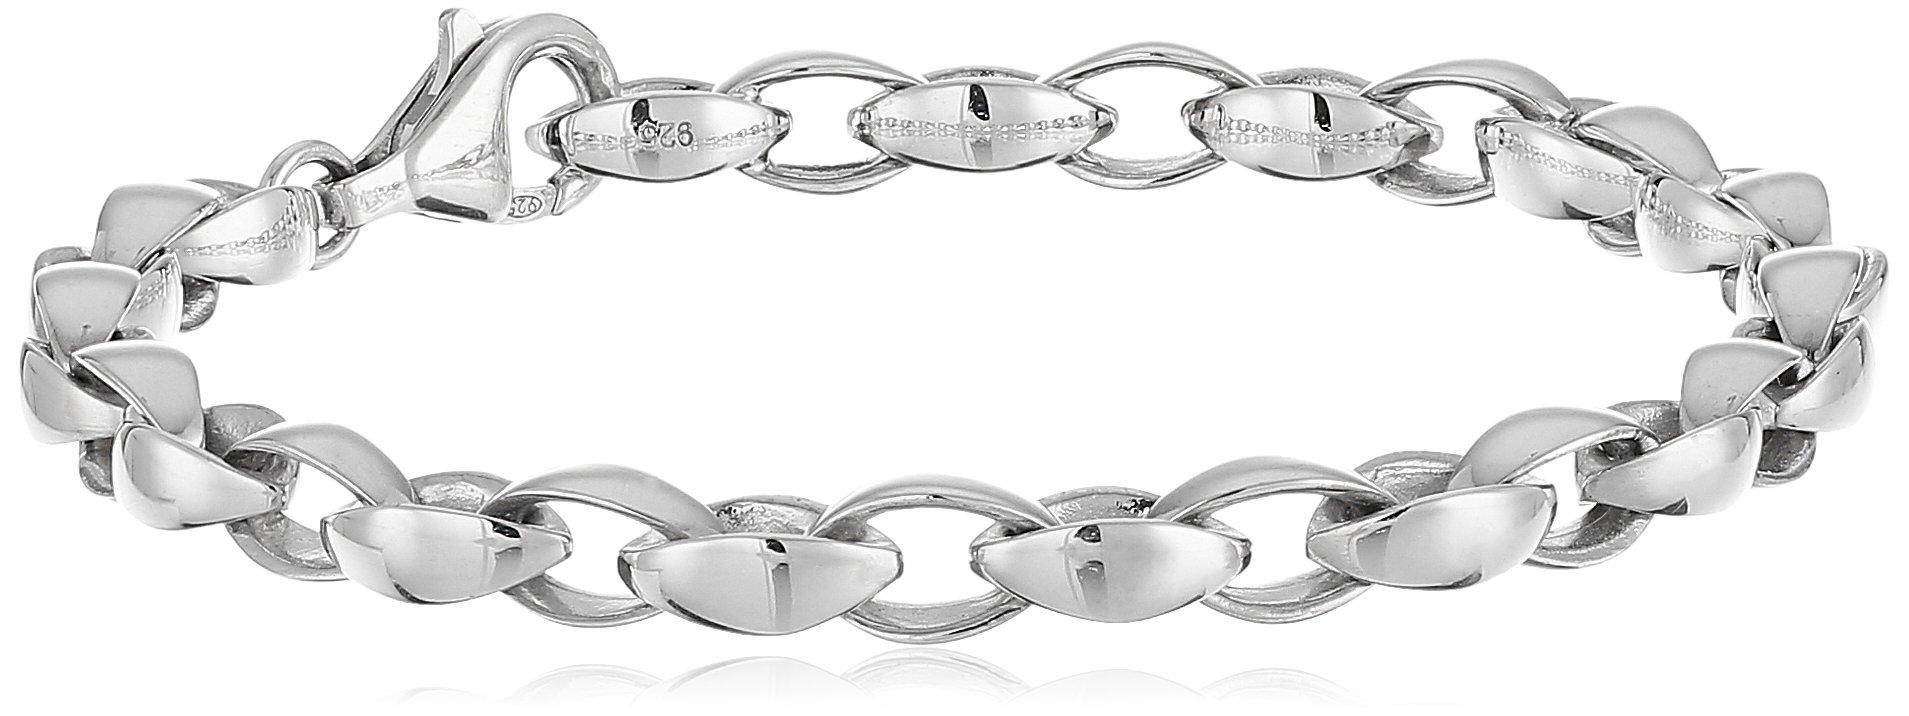 Zina Sterling Silver Silken Link Bracelet, 7.25''